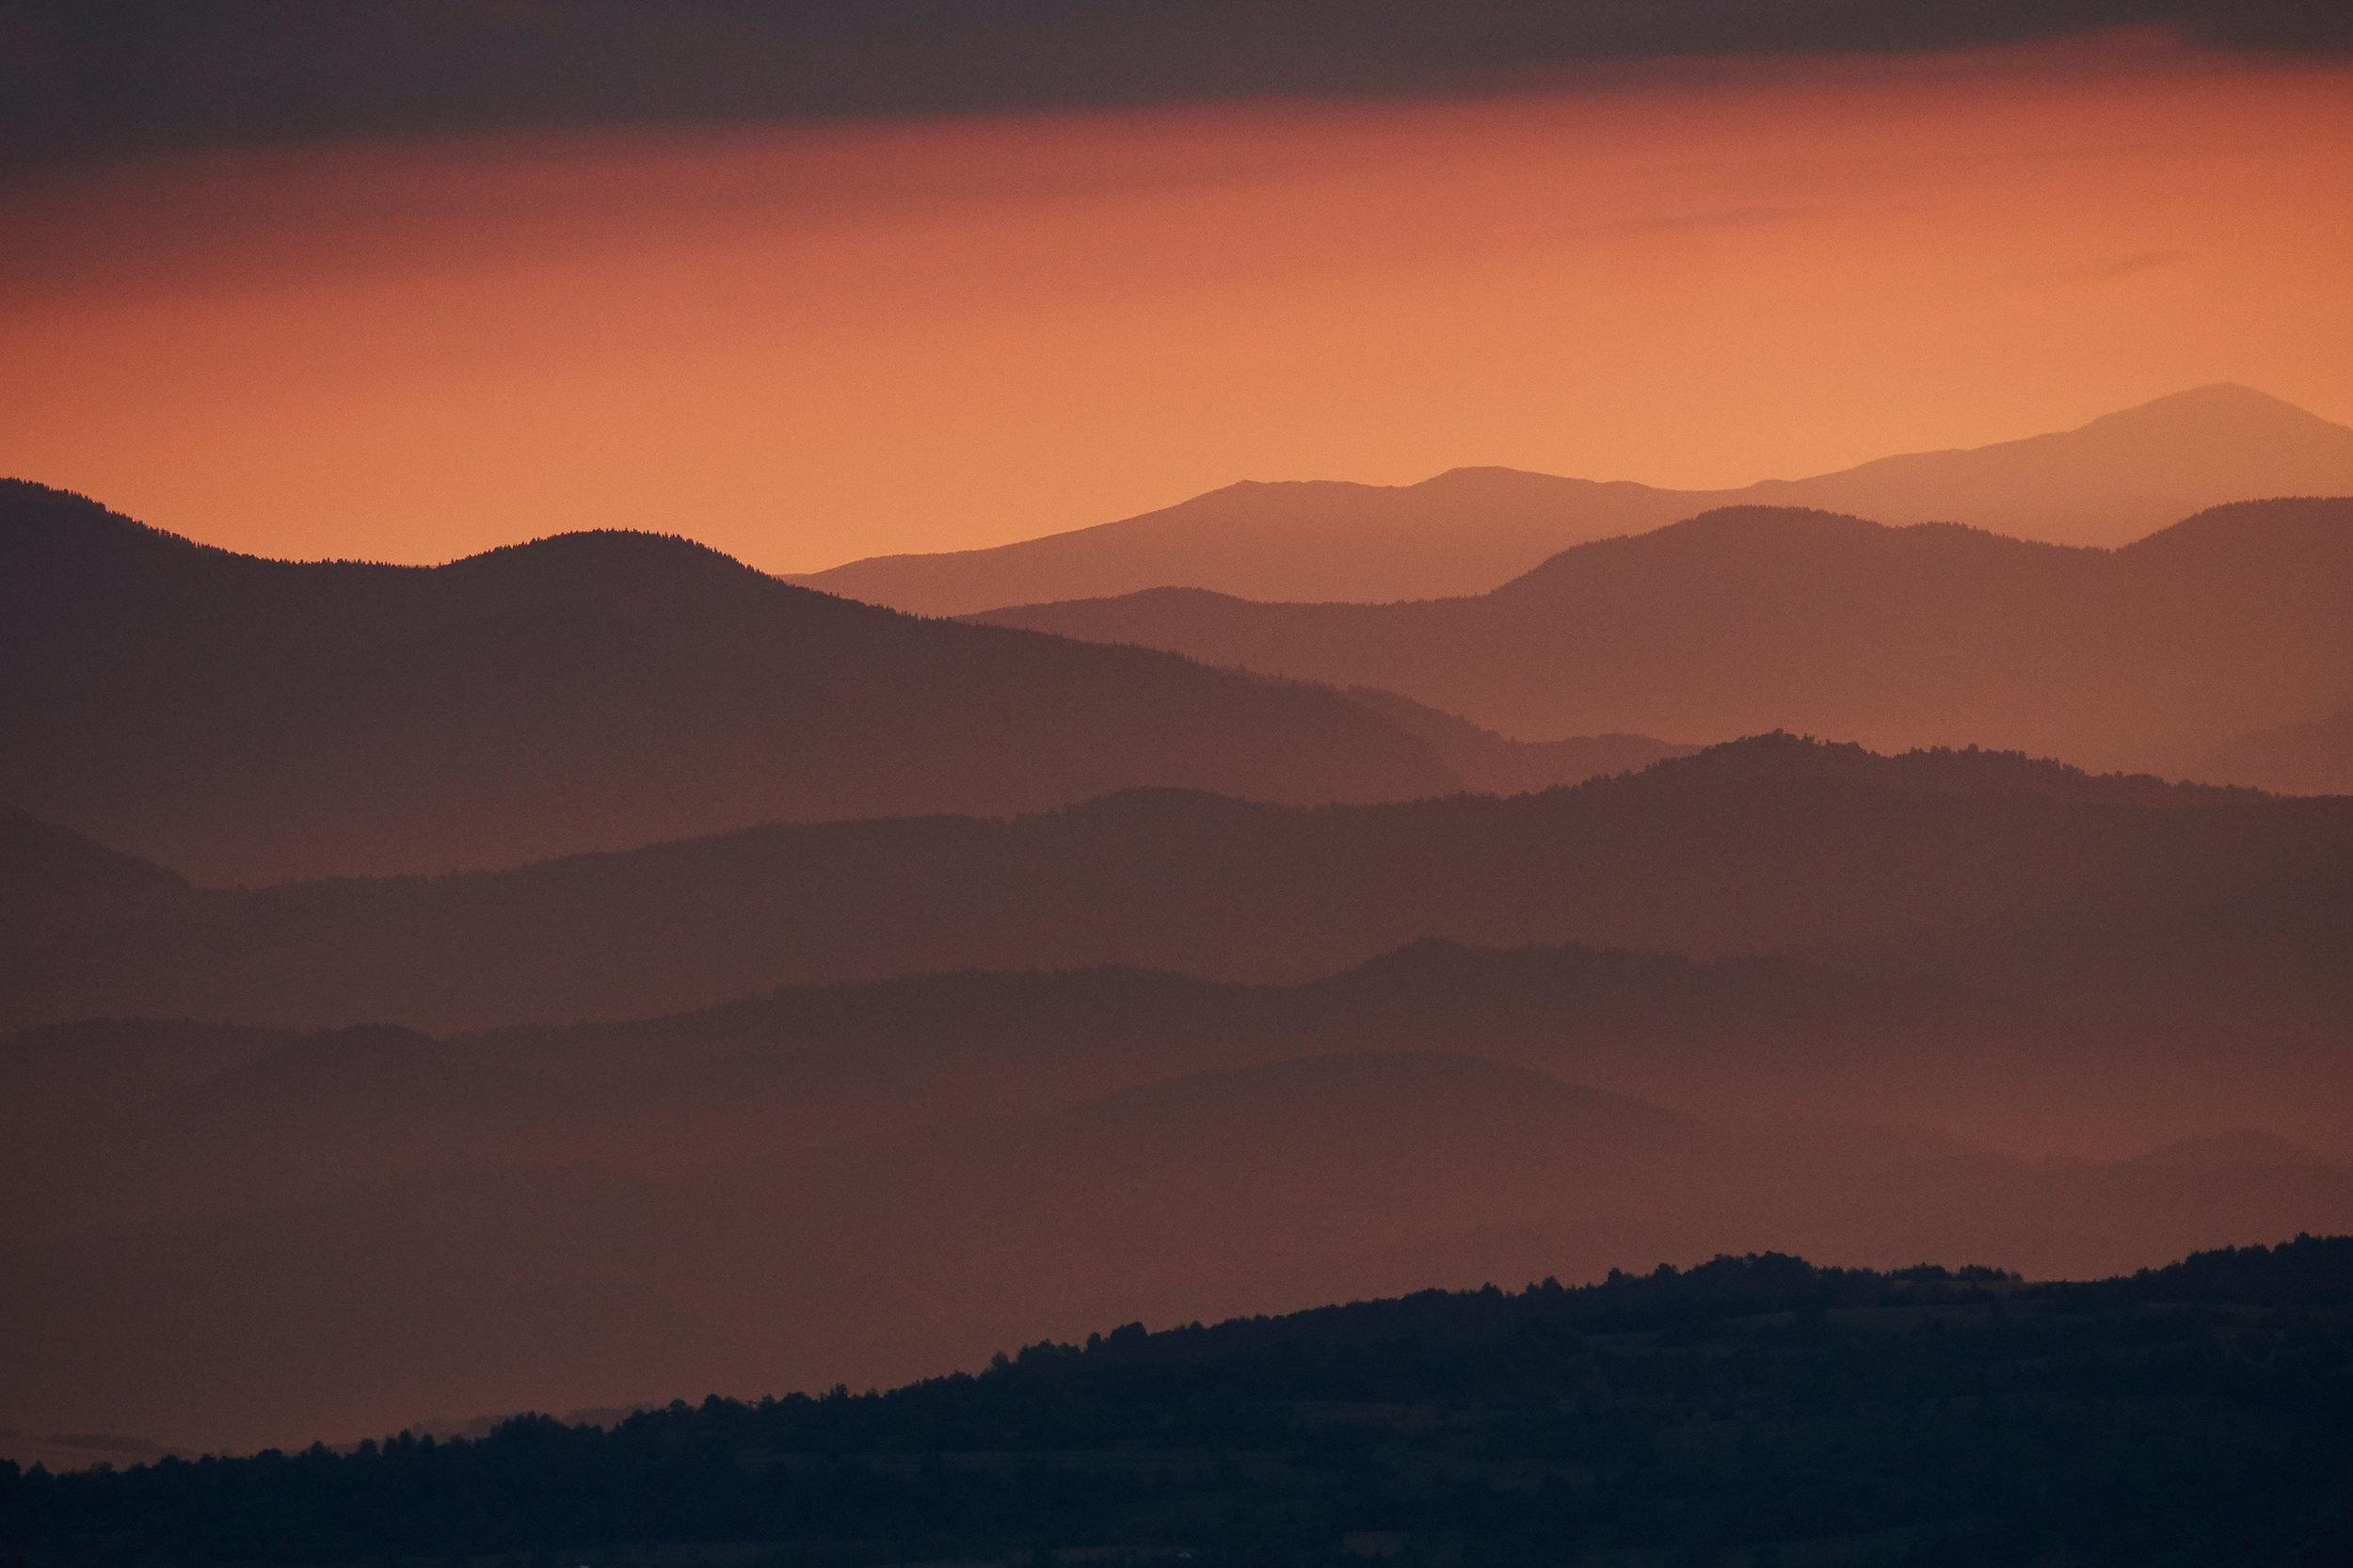 Maramures-Romania-sunrise-in-the-mountains